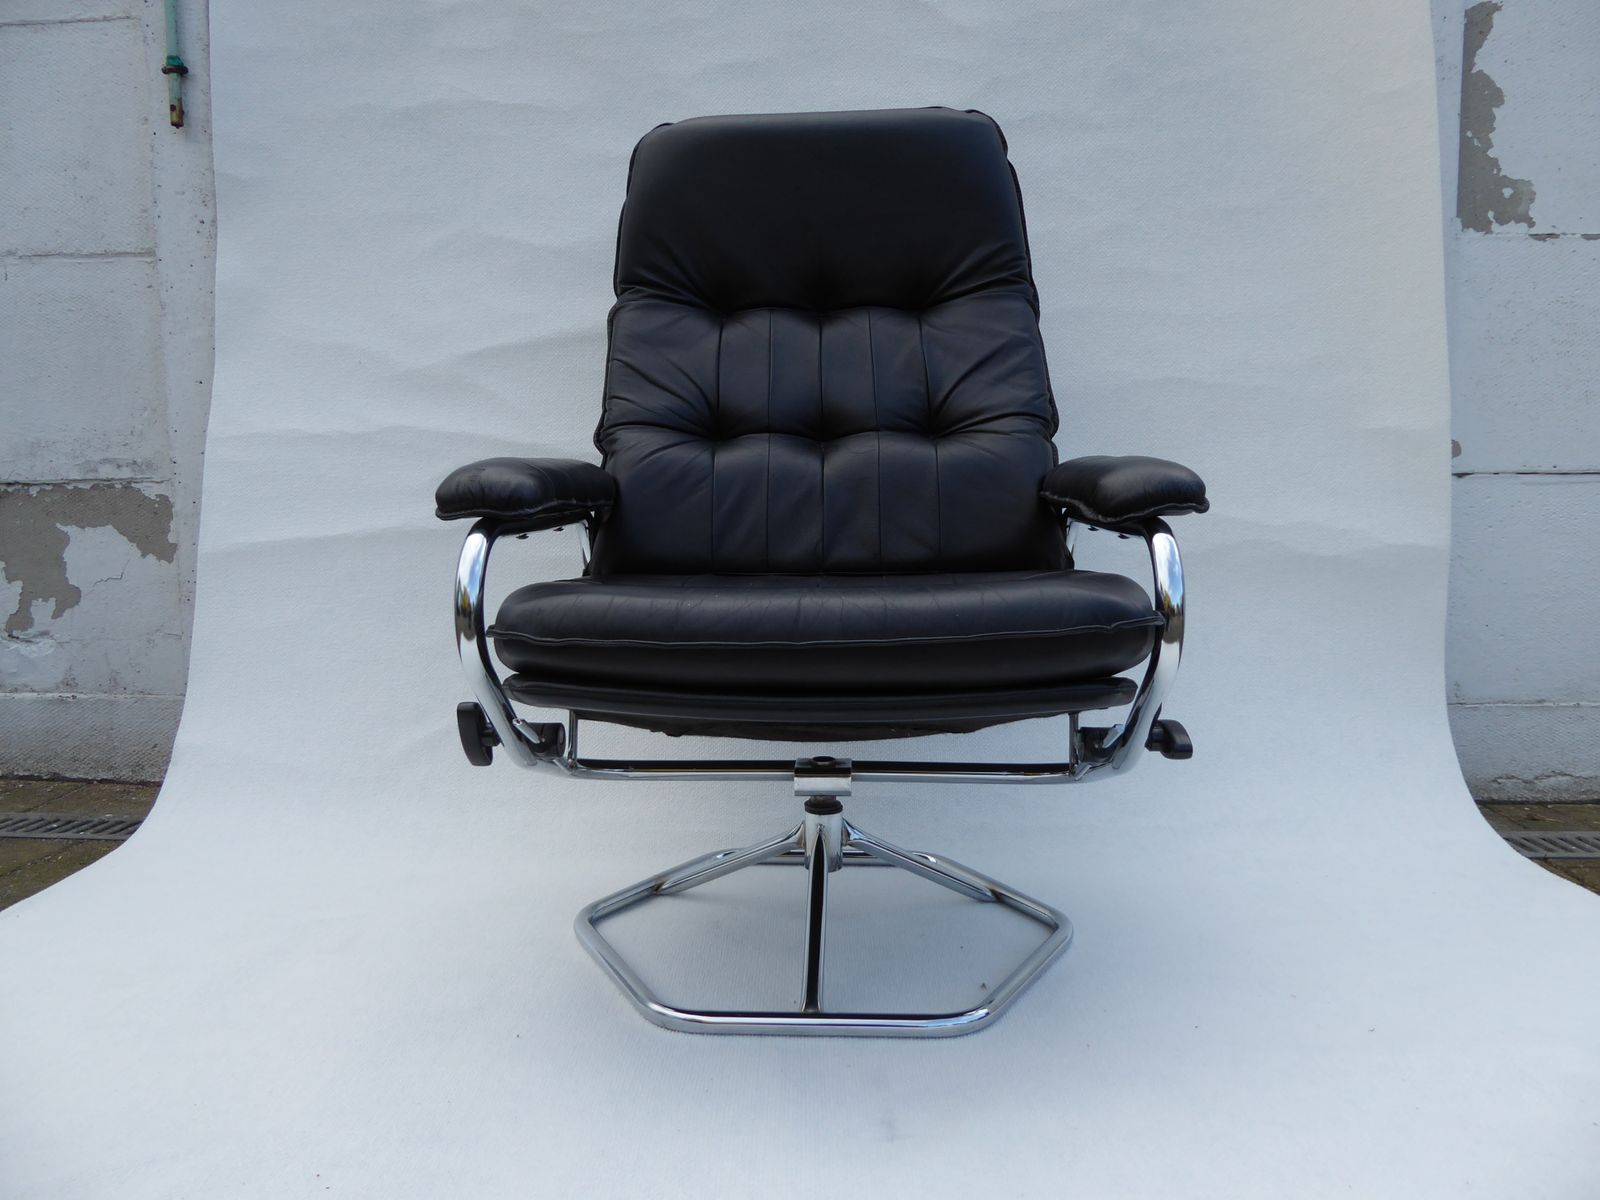 Vintage leather swivel chair - Vintage Danish Simi Leather Swivel Chair And Ottoman From Unico 1970s Set Of 2